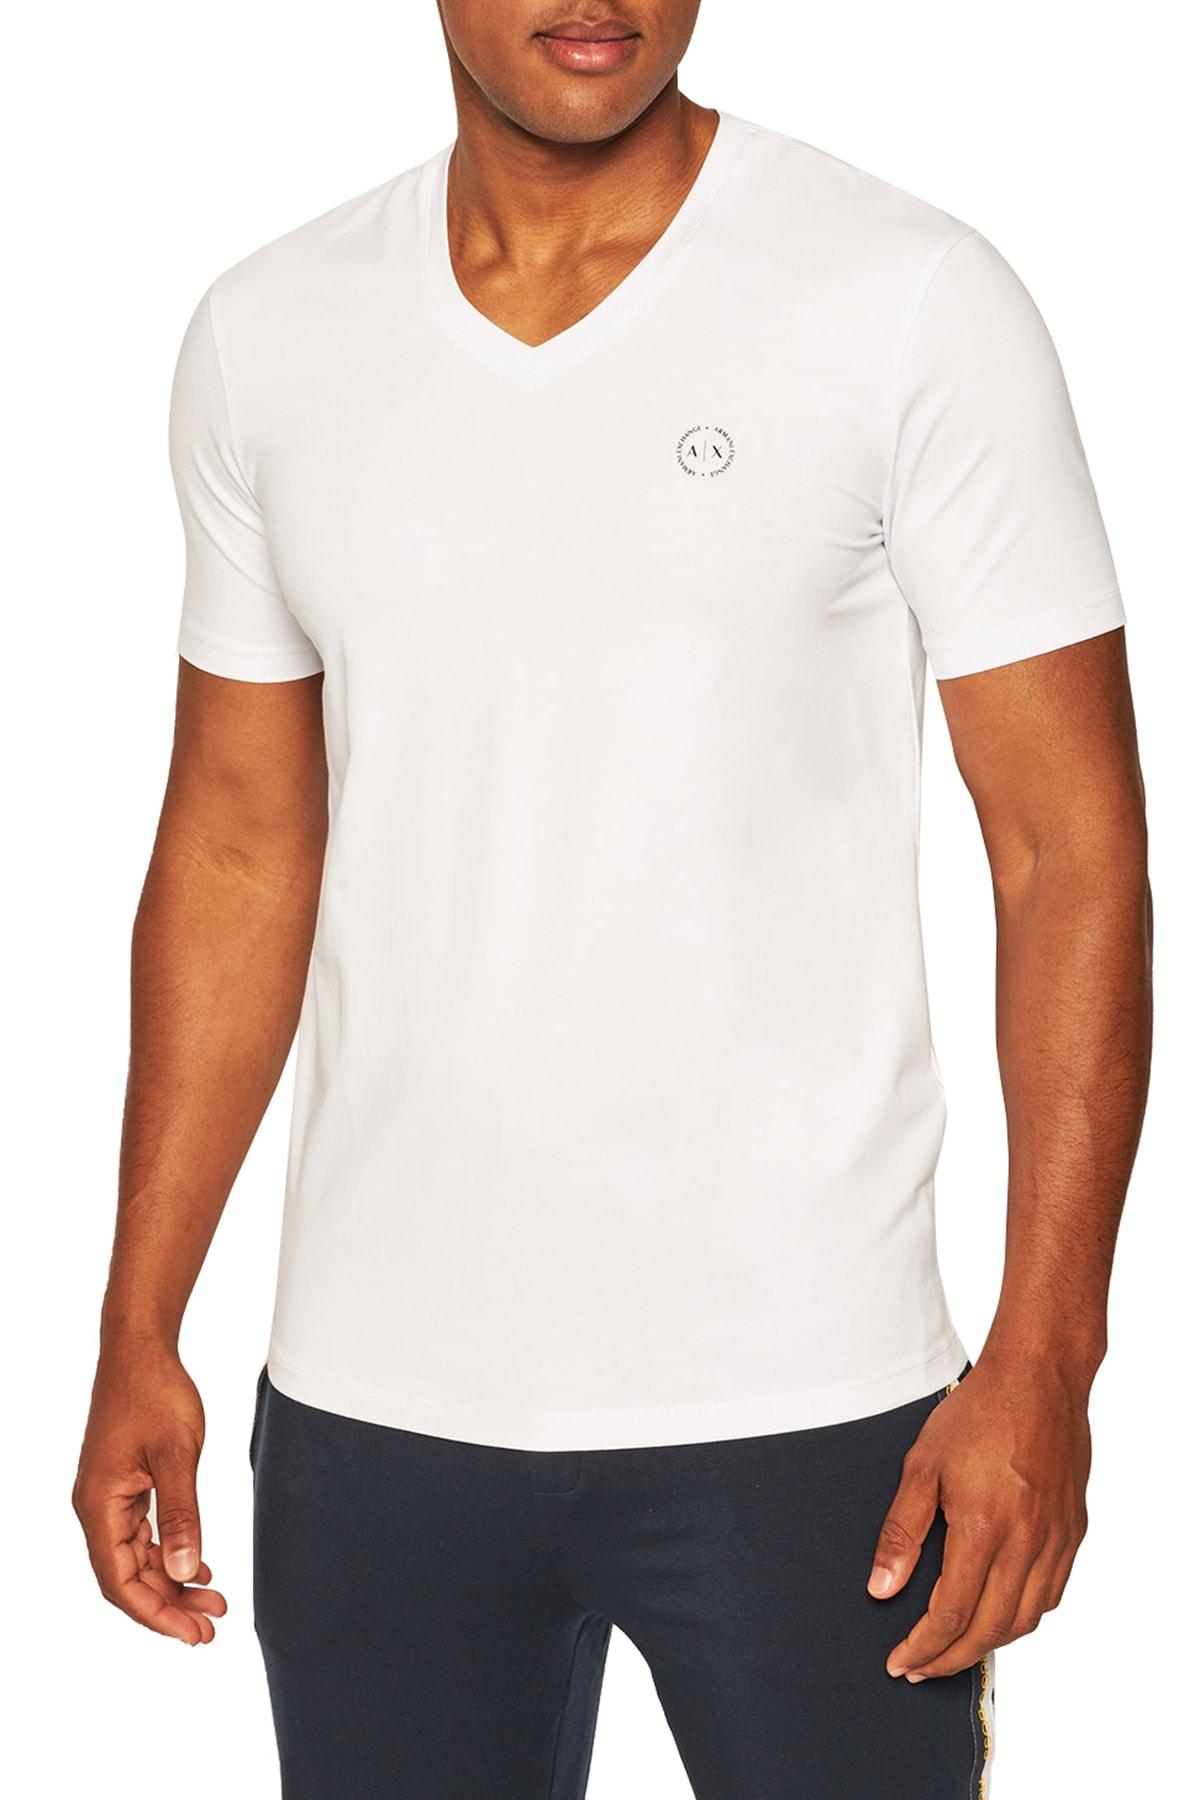 Erkek Beyaz Pamuklu V Yaka Regular Fit T Shirt S 8nzt85 Z8m9z 2181